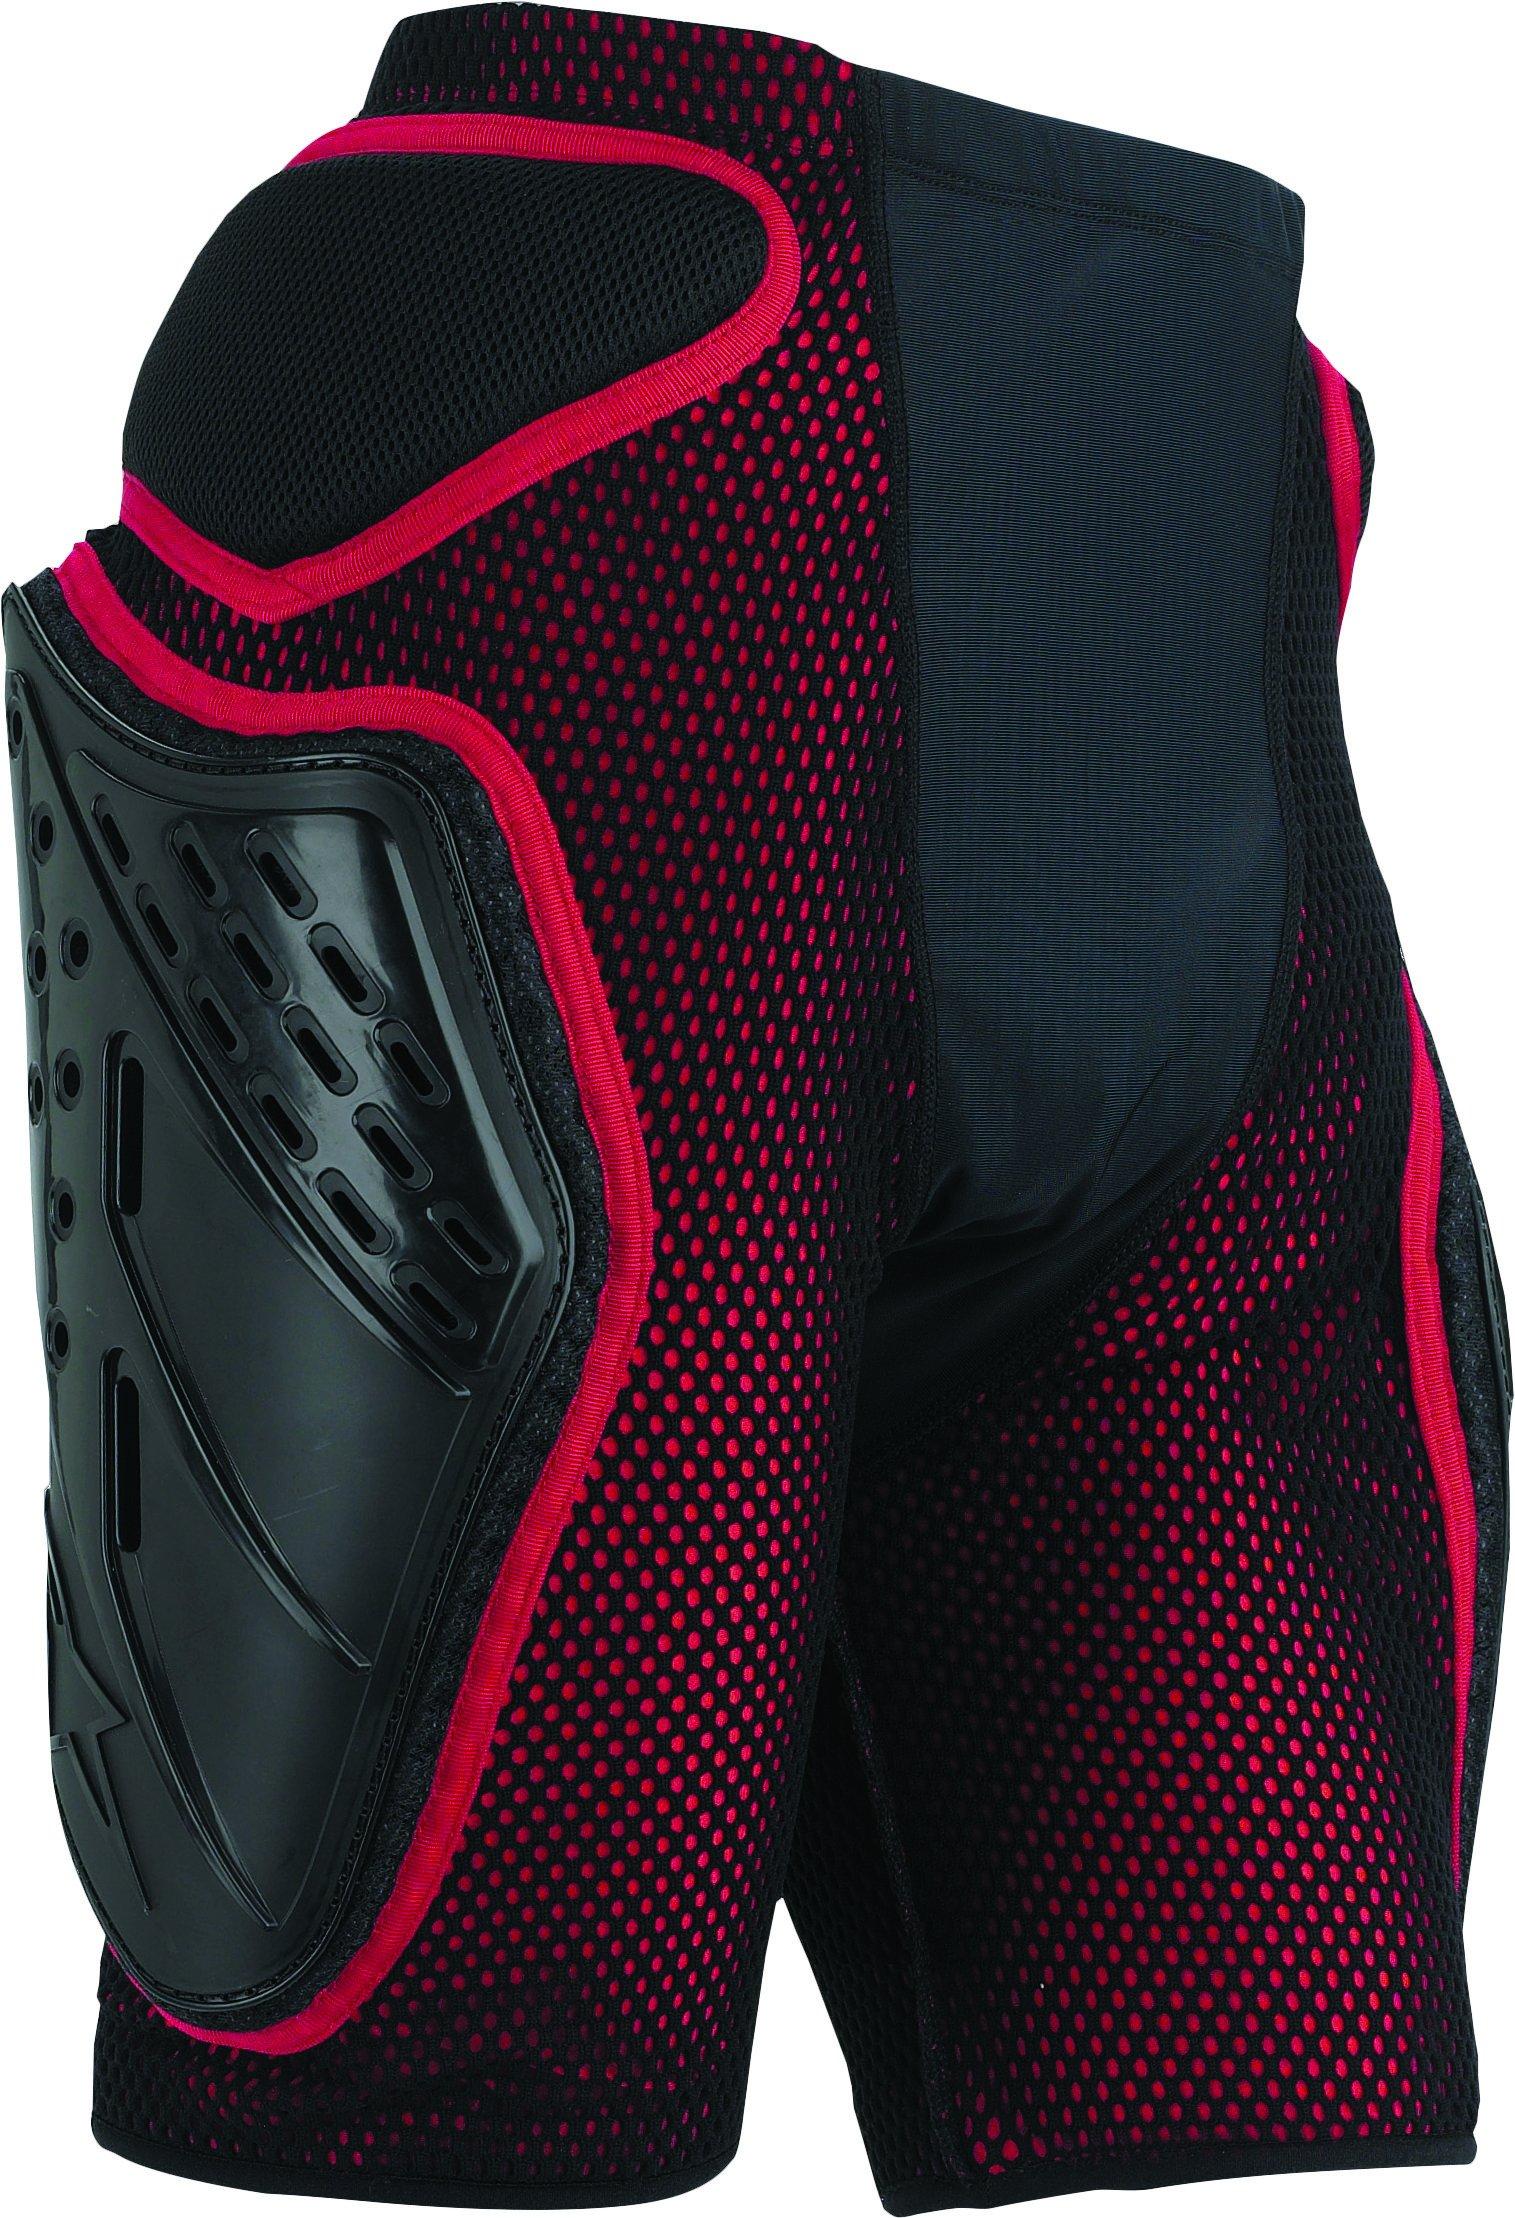 Alpinestars Bionic Freeride Shorts (Black/Red, X-Large) by Alpinestars (Image #1)